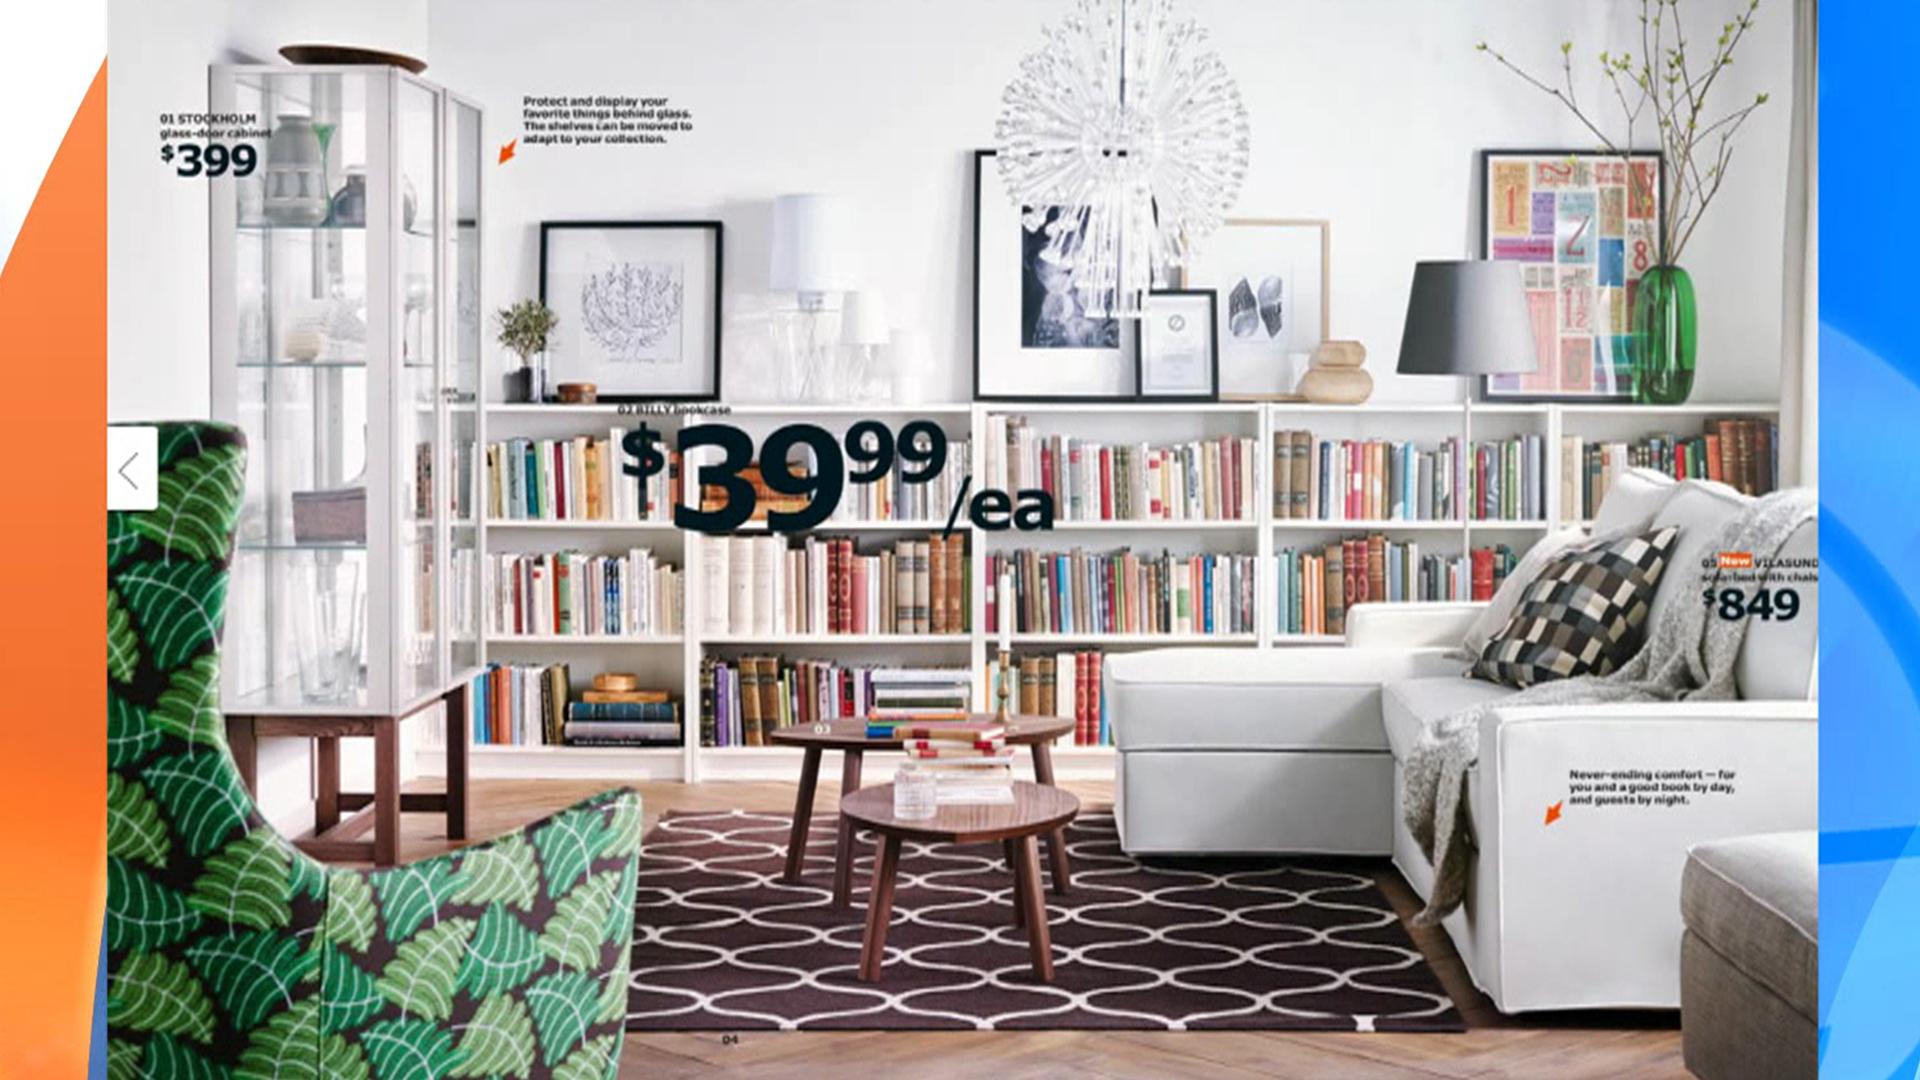 ikea reveals 75 of catalog images are cgi. Black Bedroom Furniture Sets. Home Design Ideas